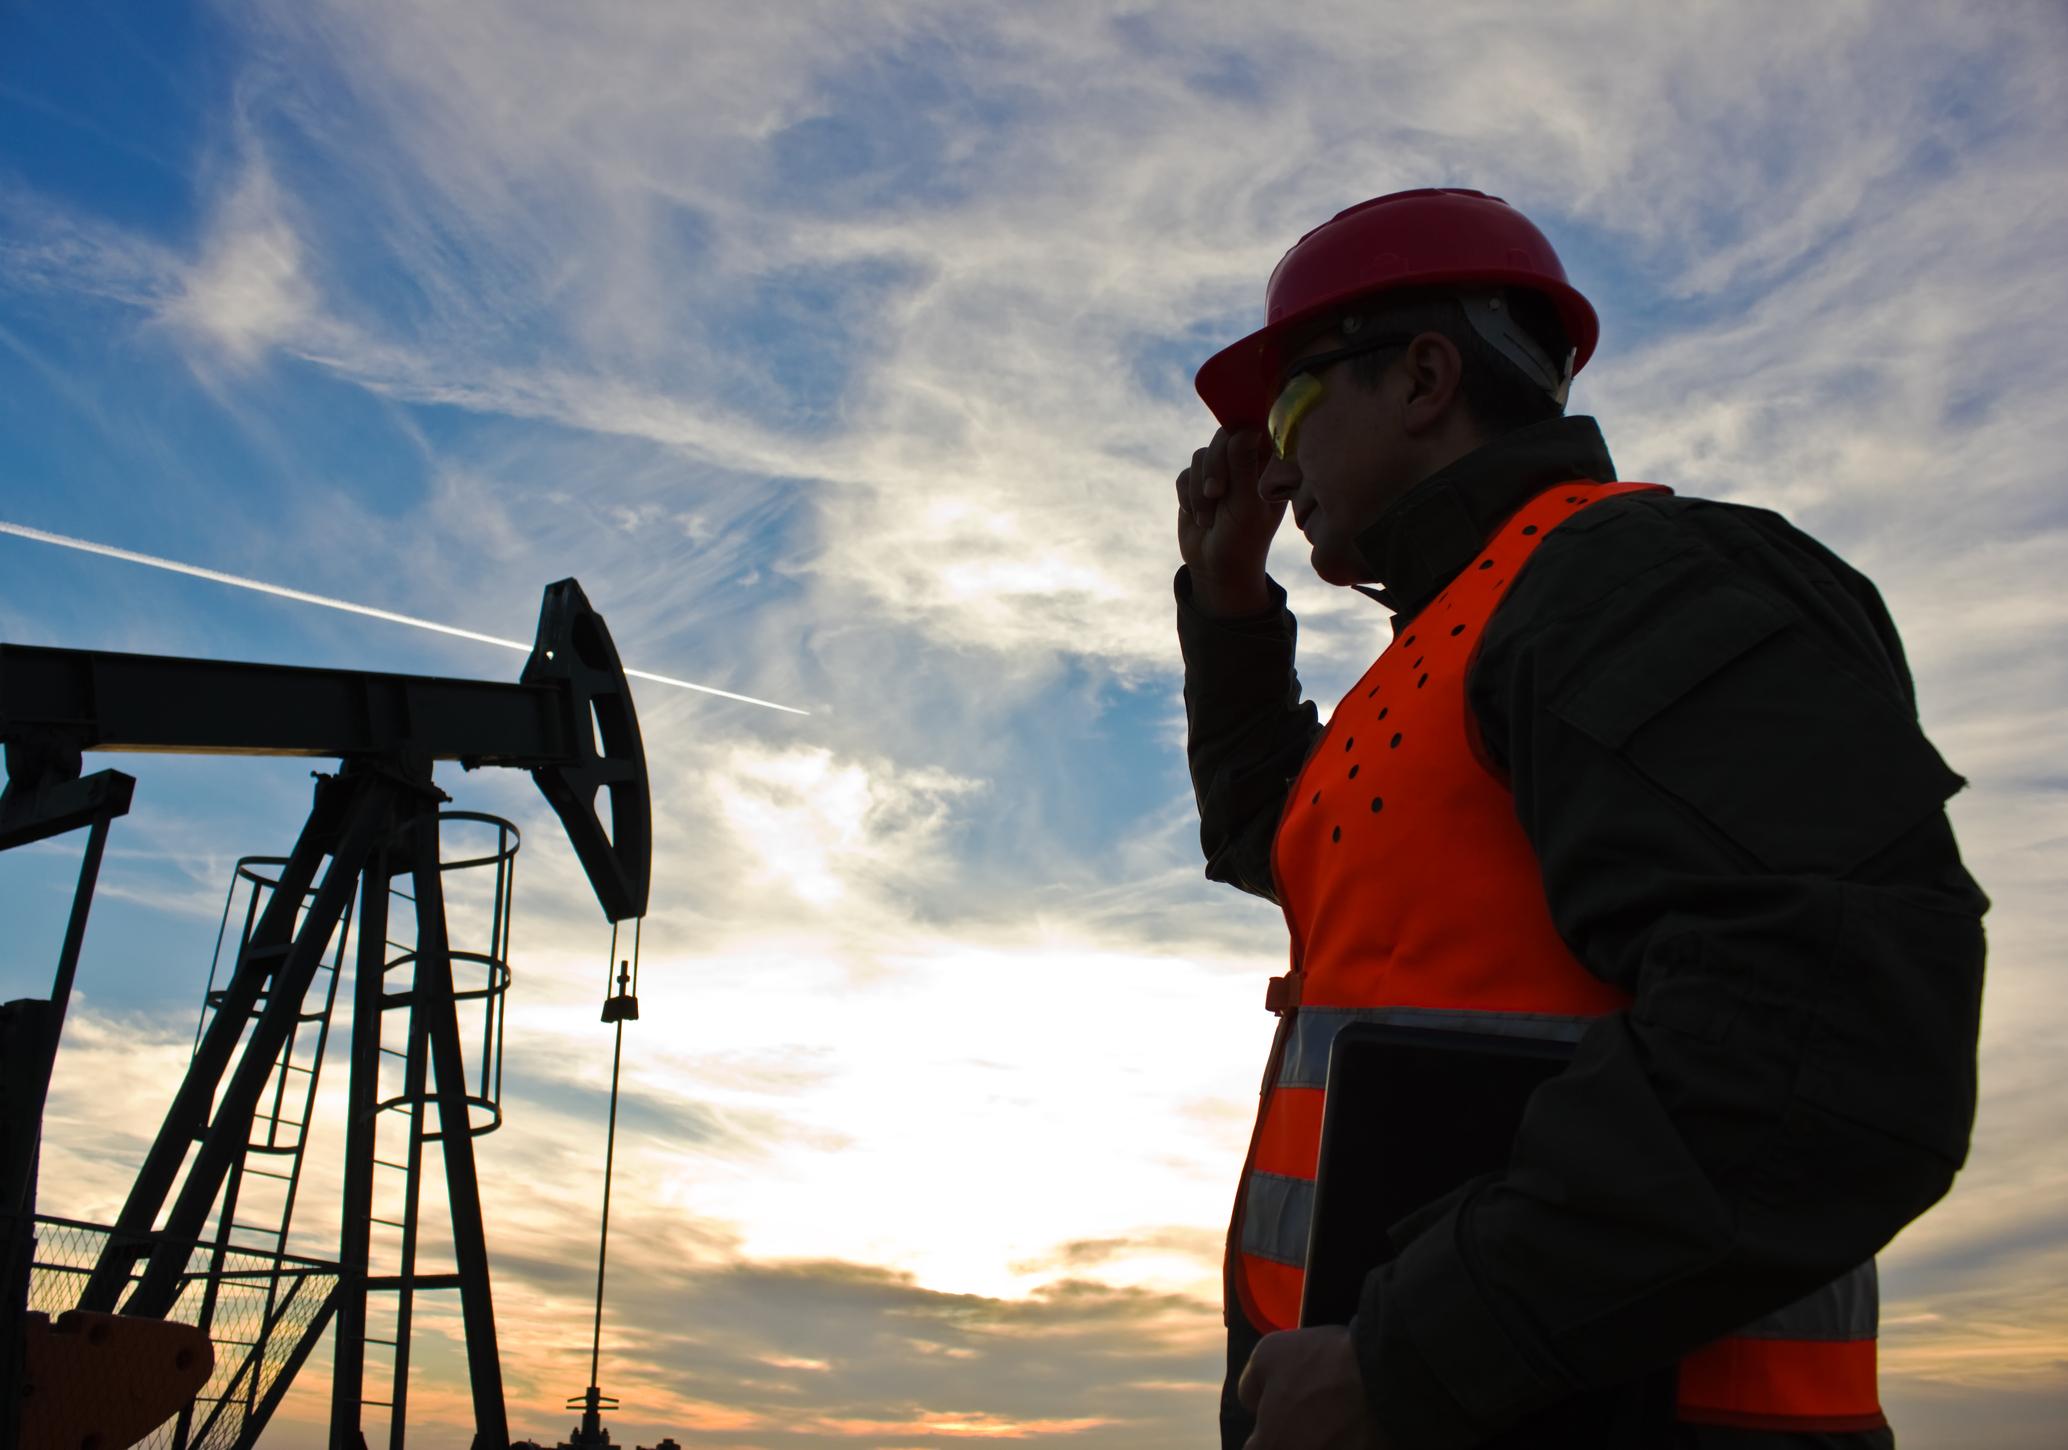 An oil worker with a laptop standing near an oil pump jack.